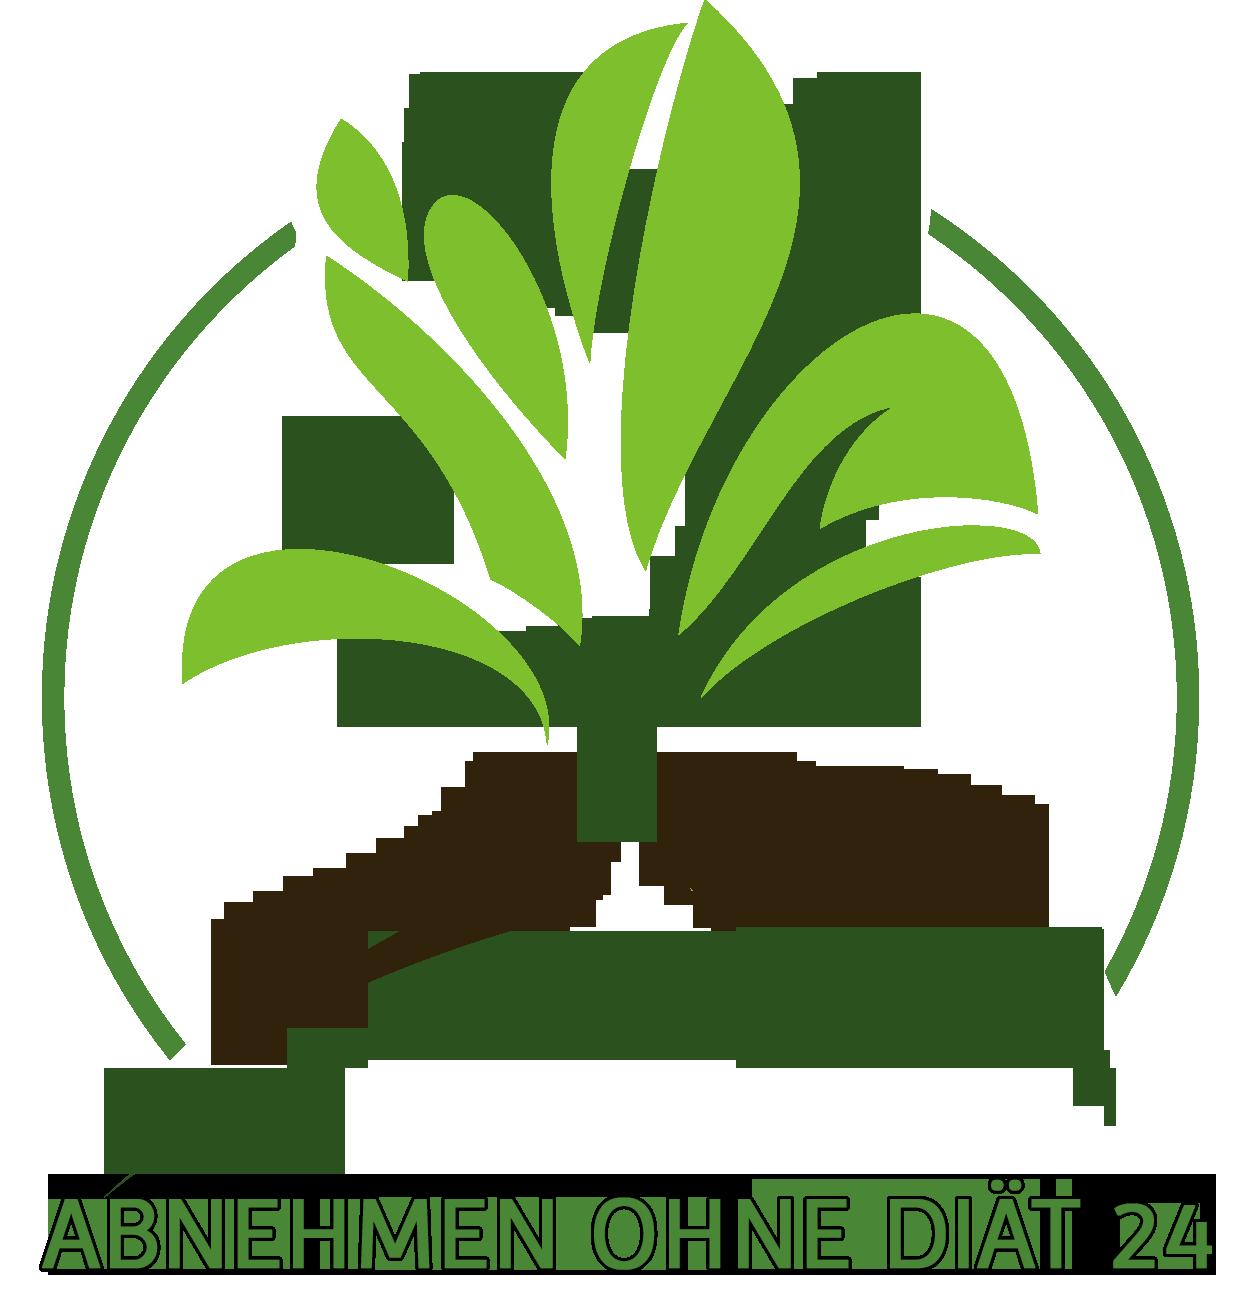 abnehmen-ohne-diaet-24.de